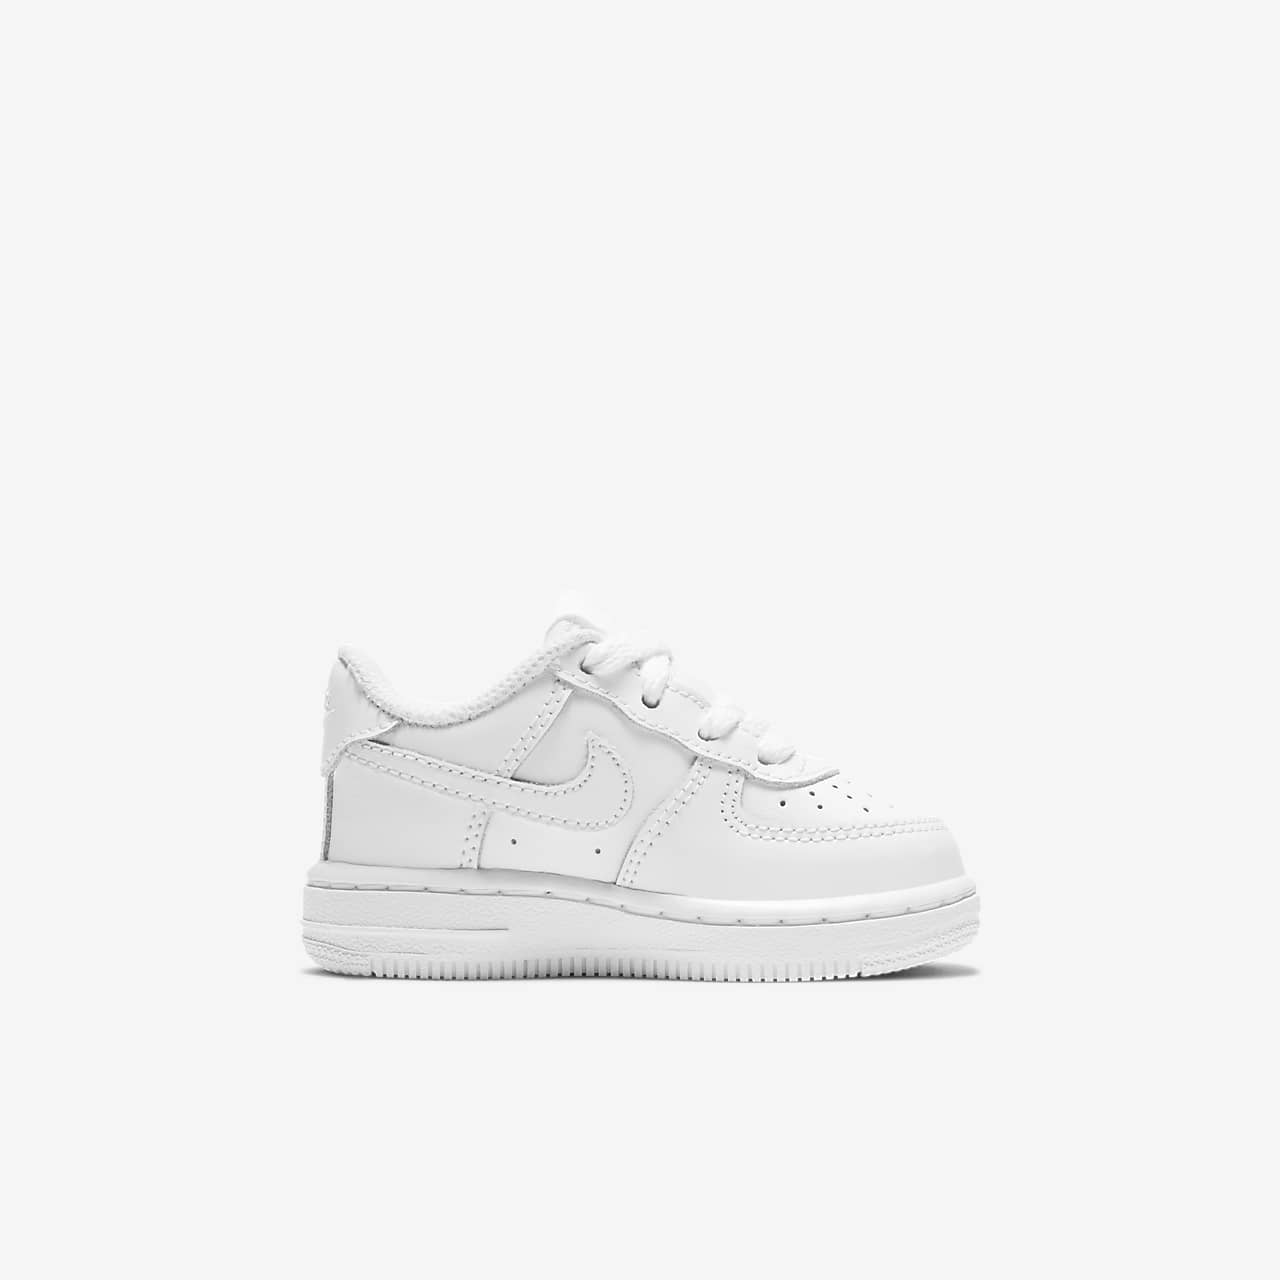 e074e9d06539e Chaussure Nike Air Force I 06 pour Tr egrave s jeune gar ccedil on ...